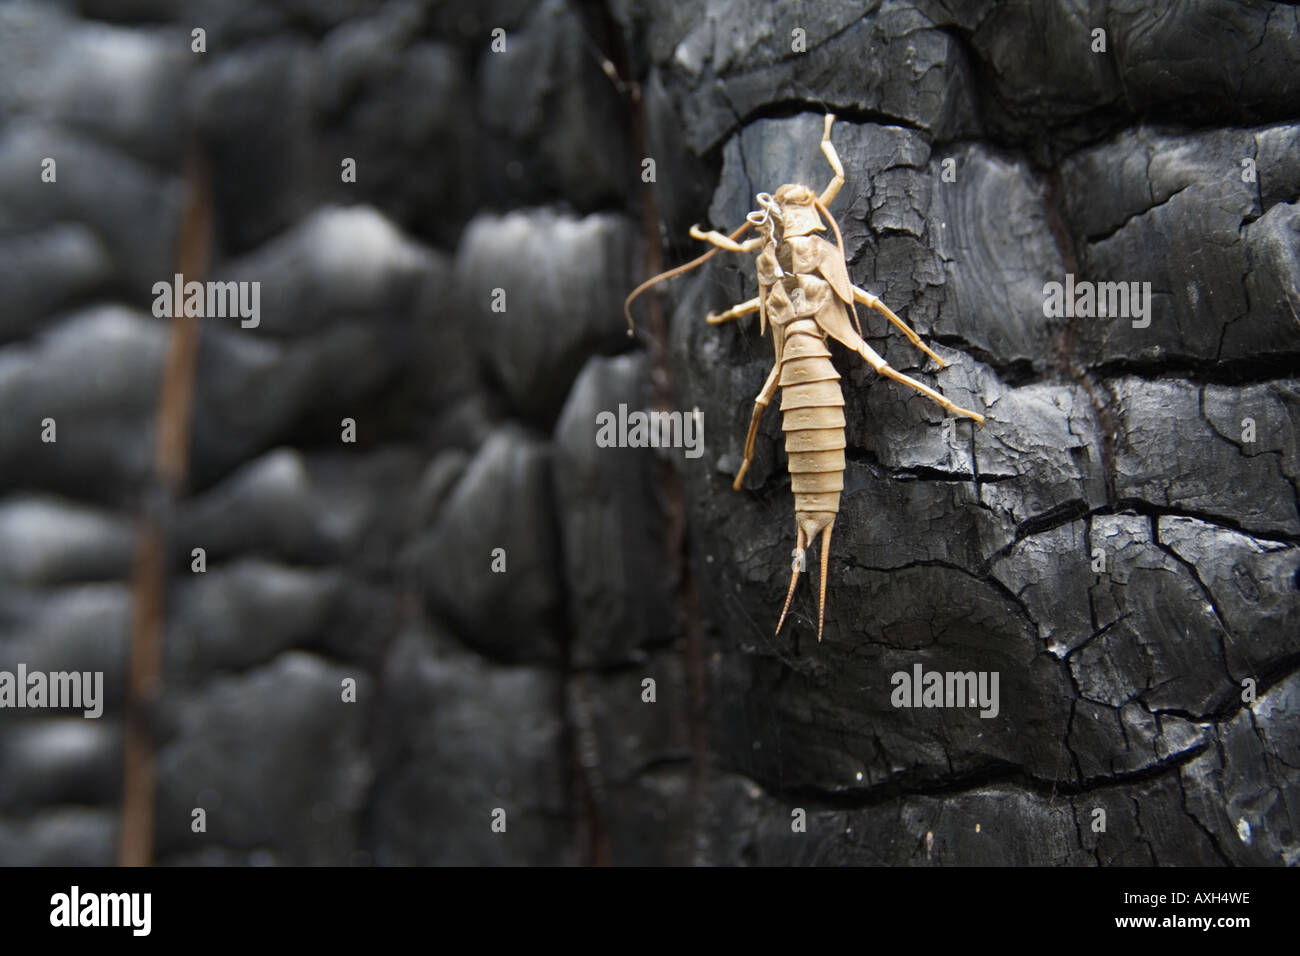 Empty Plecoptera stonefly nymph shell on burned log - Stock Image